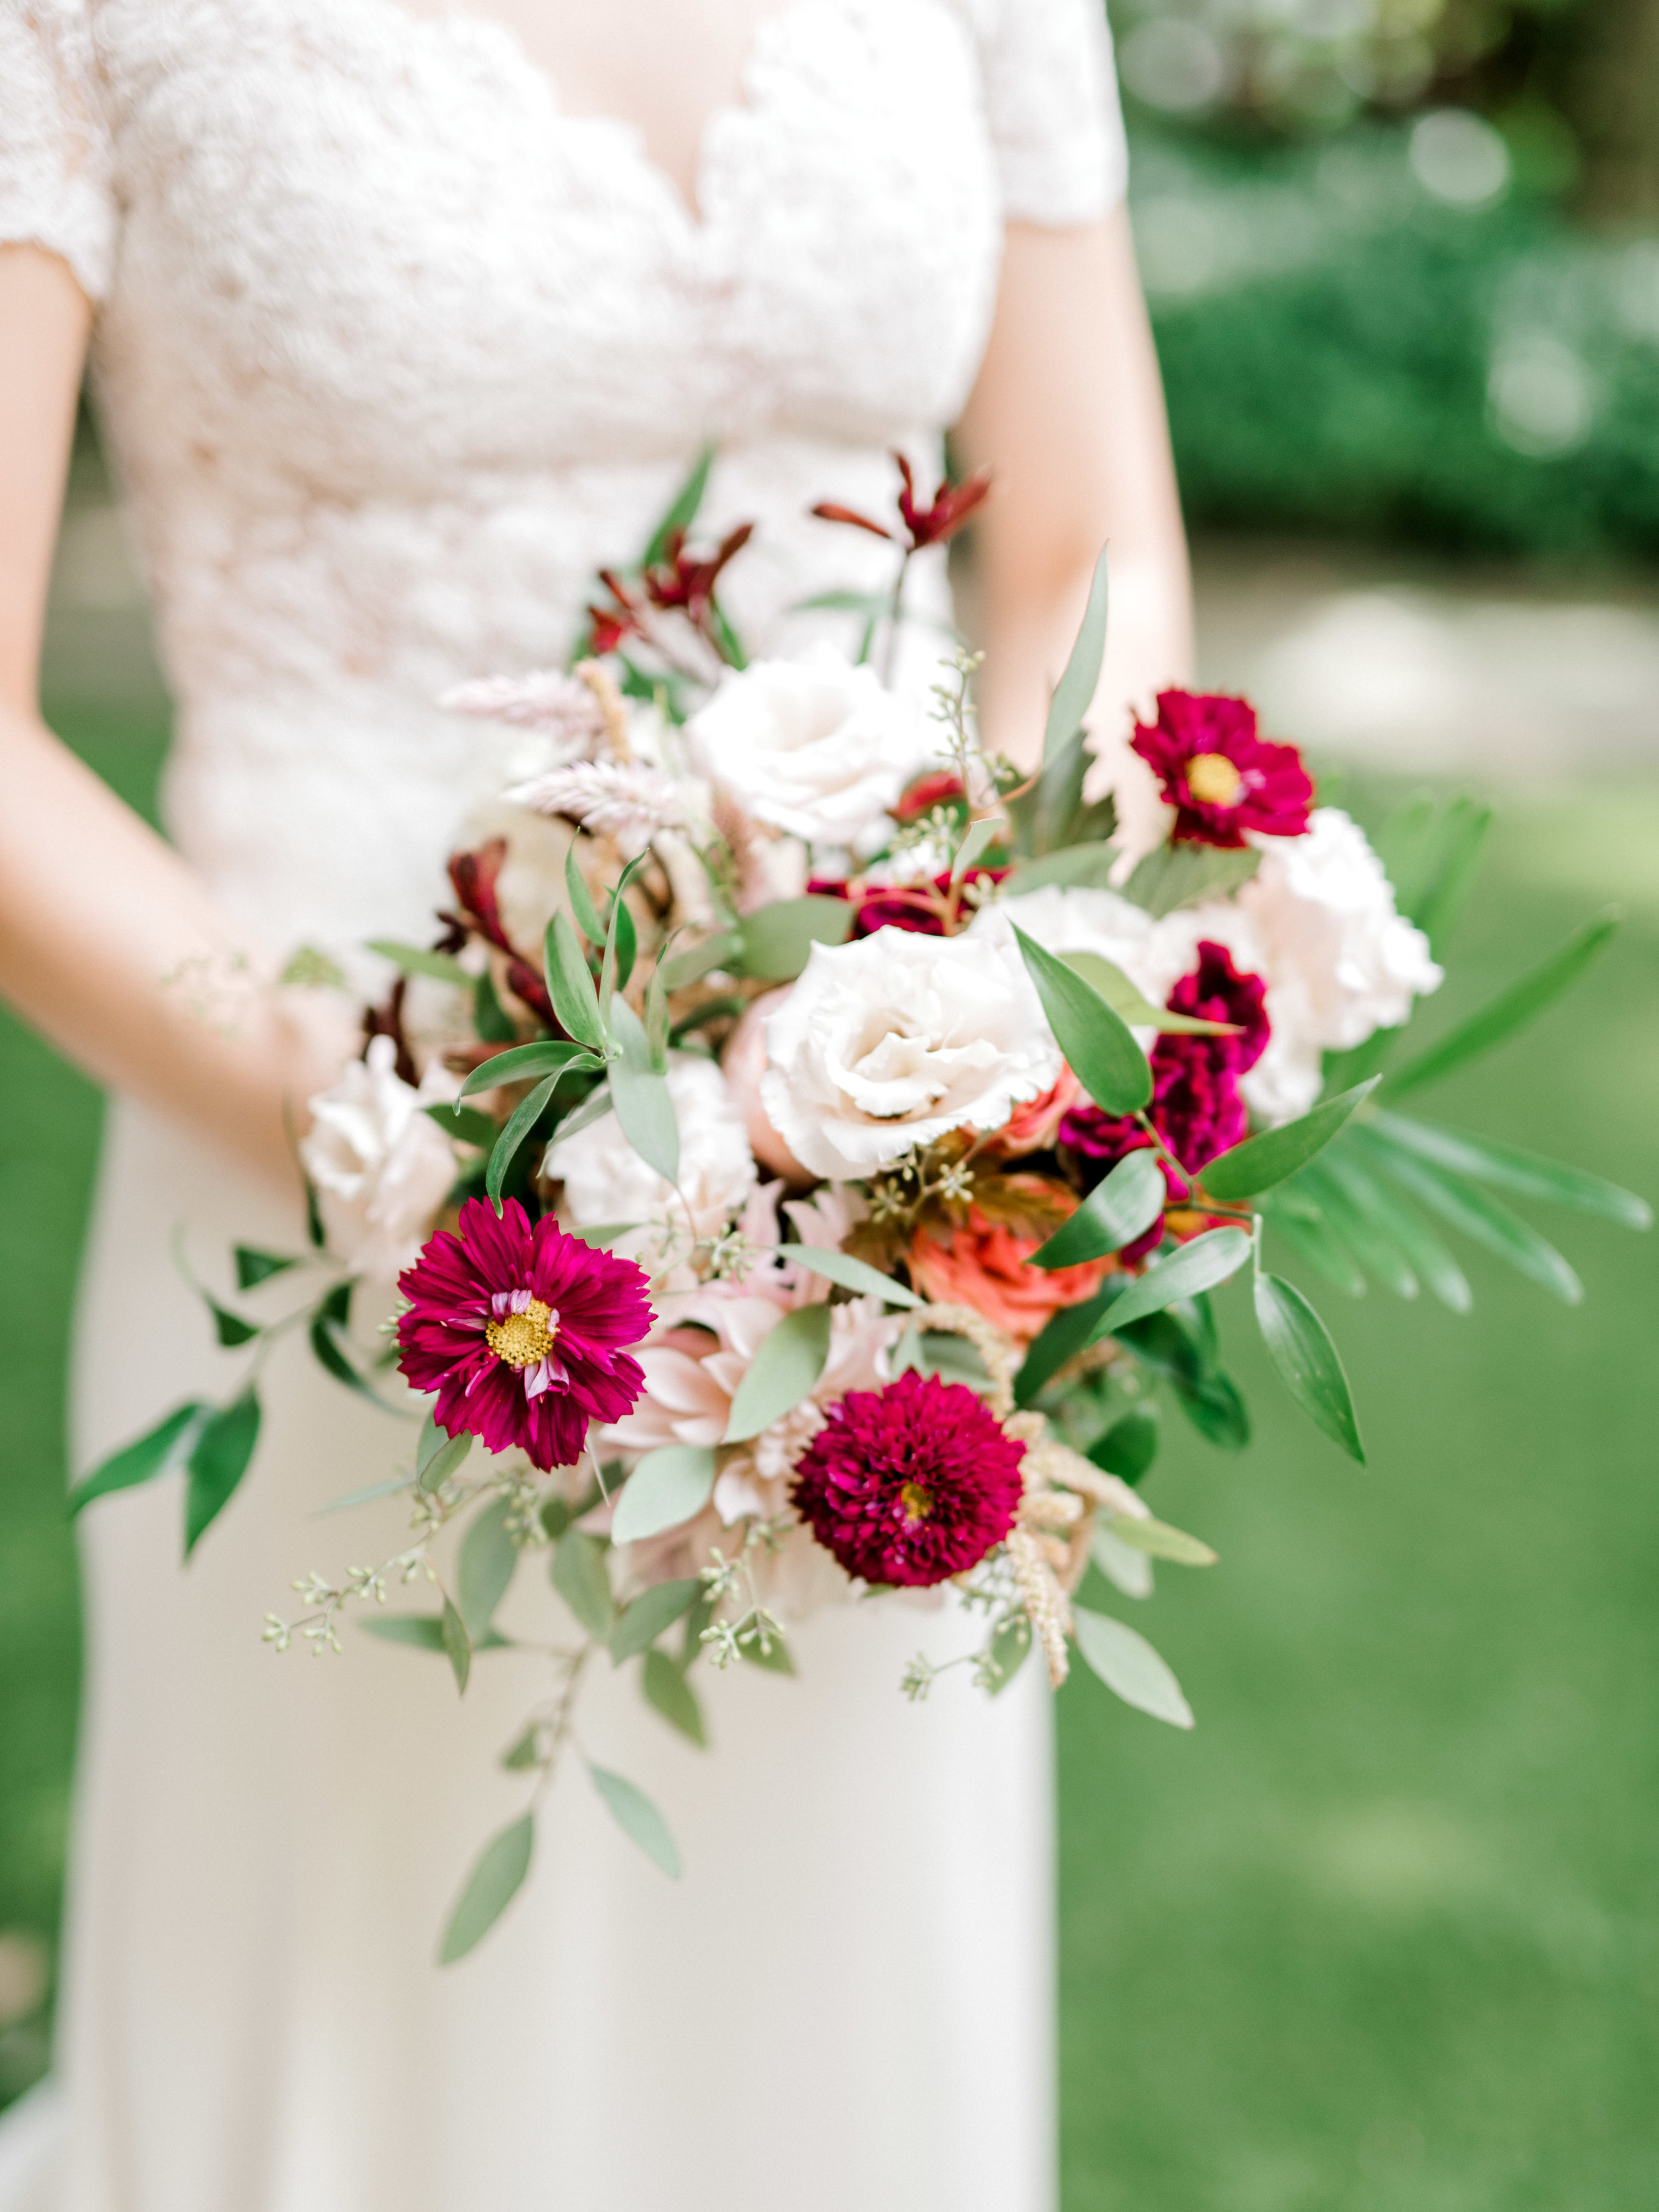 haley-richter-photography-colonial-dames-philadelphia-summer-garden-wedding-088.jpg